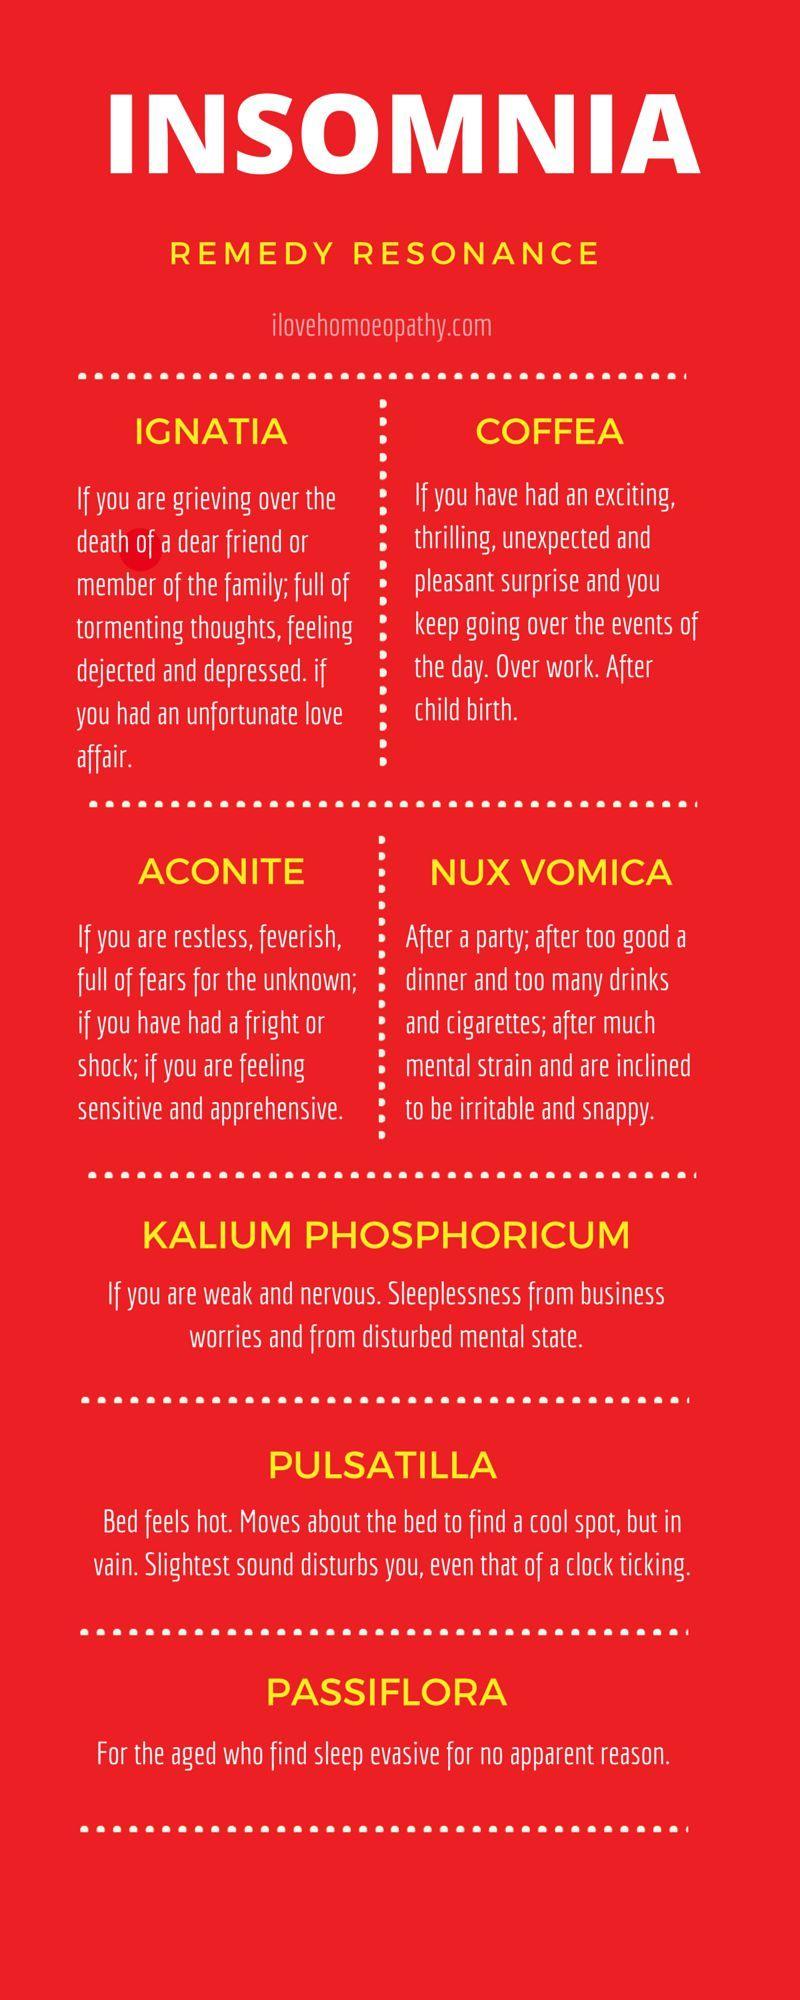 Insomnia Remedies- I Love Homeopathy